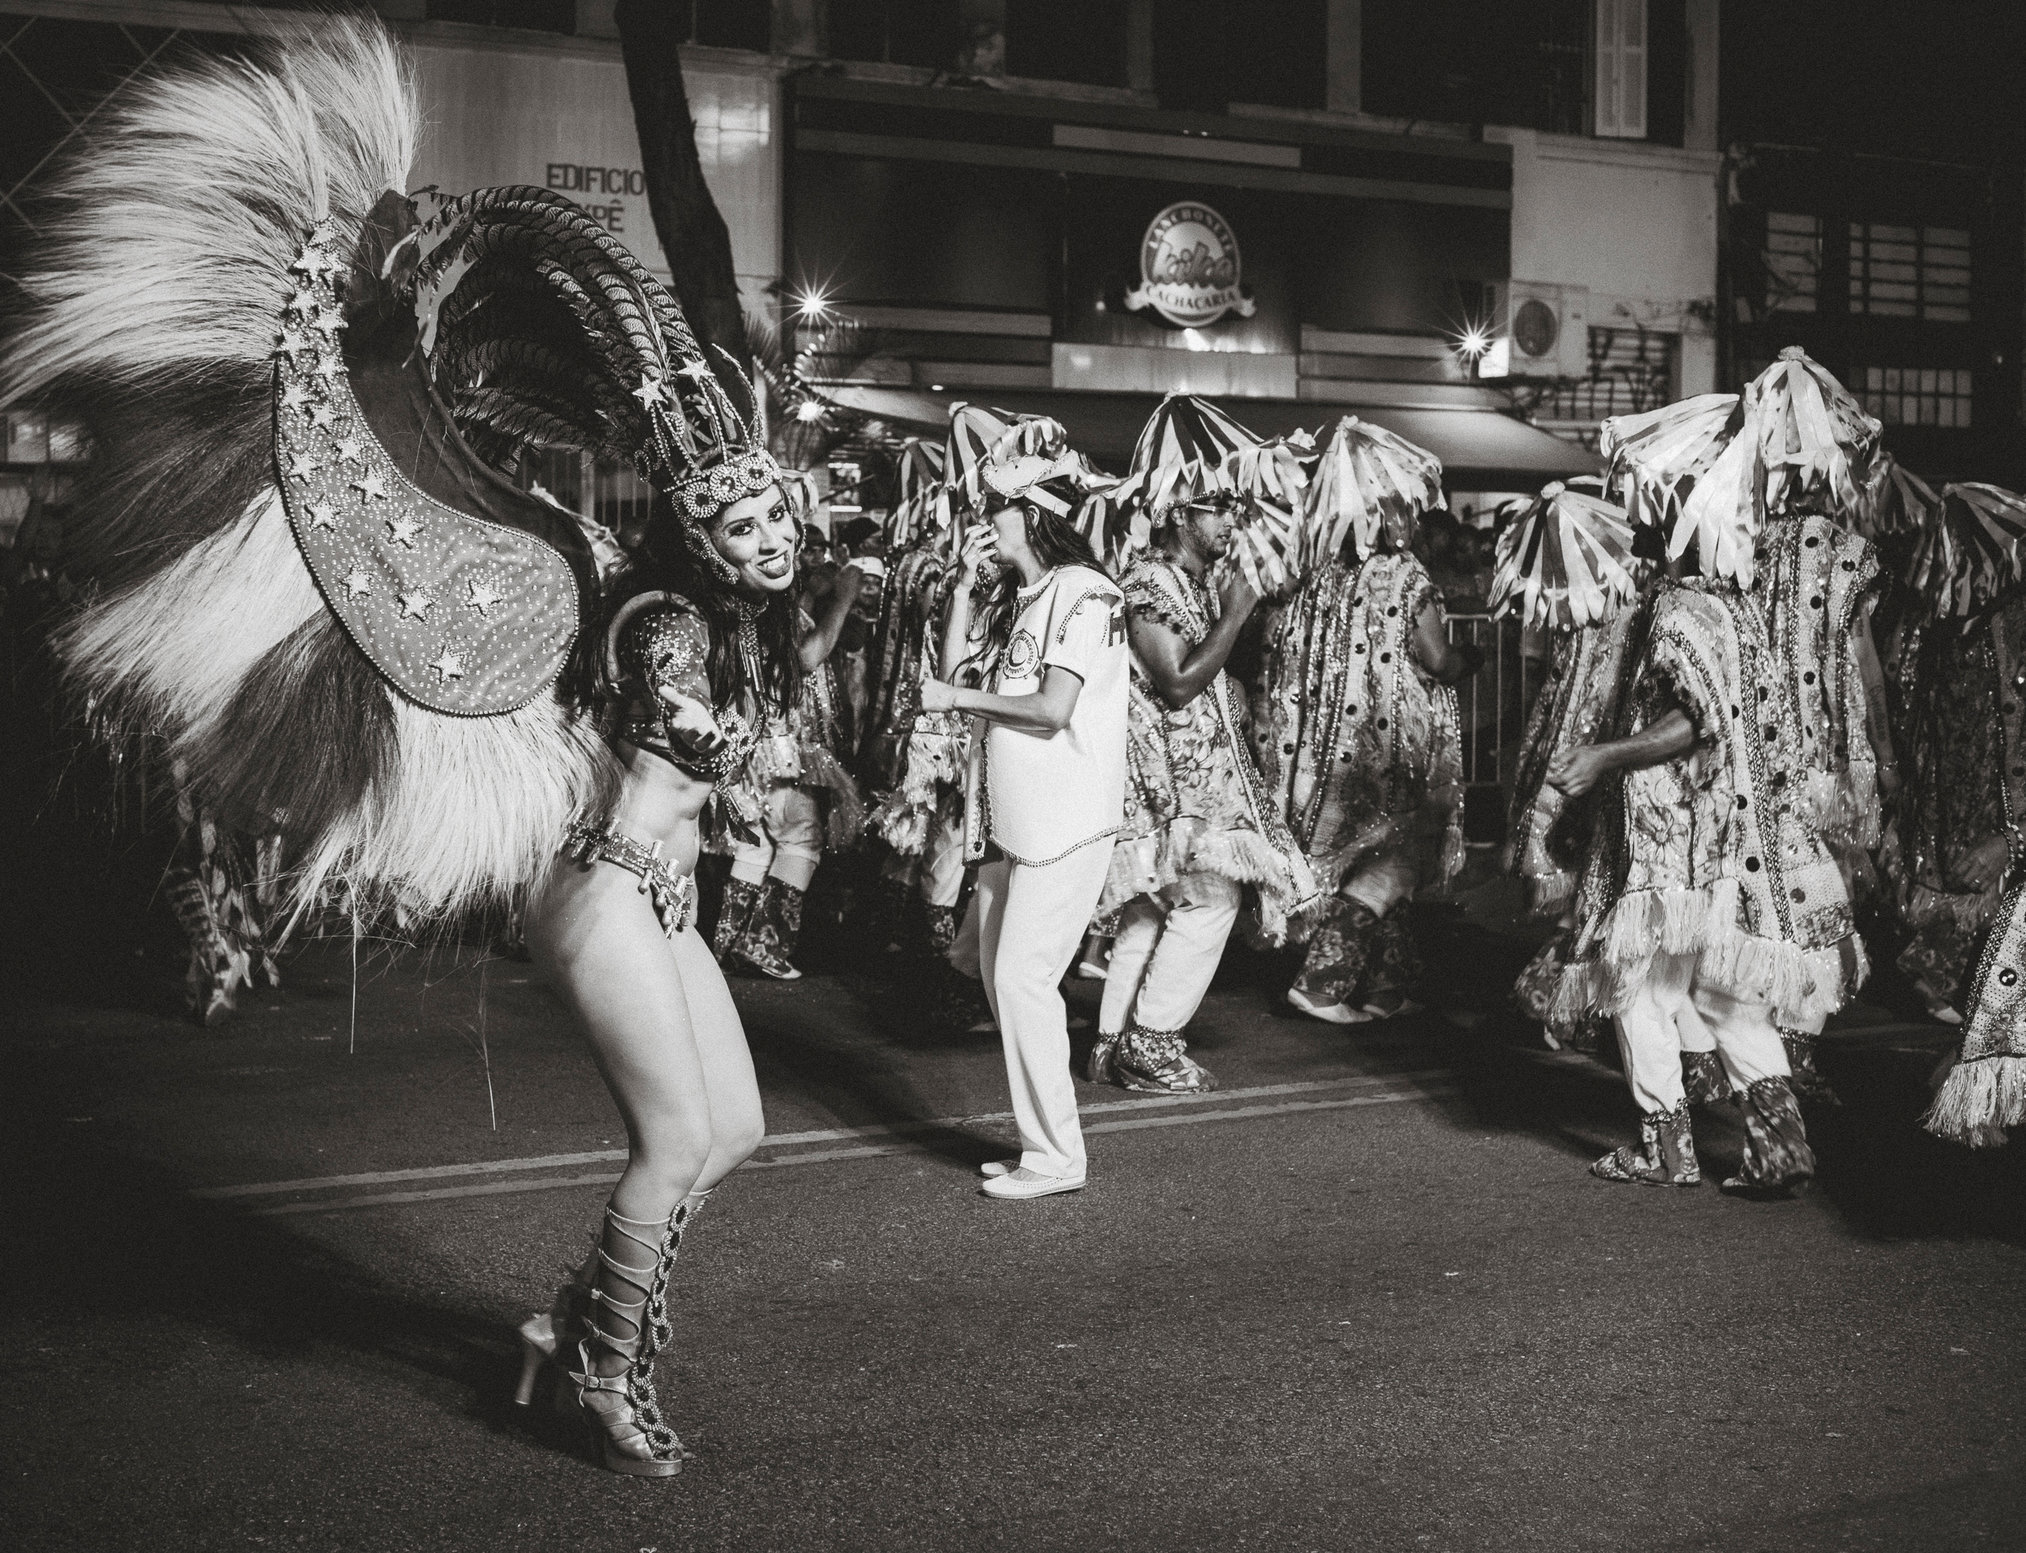 20180211-Carnaval-152.jpg